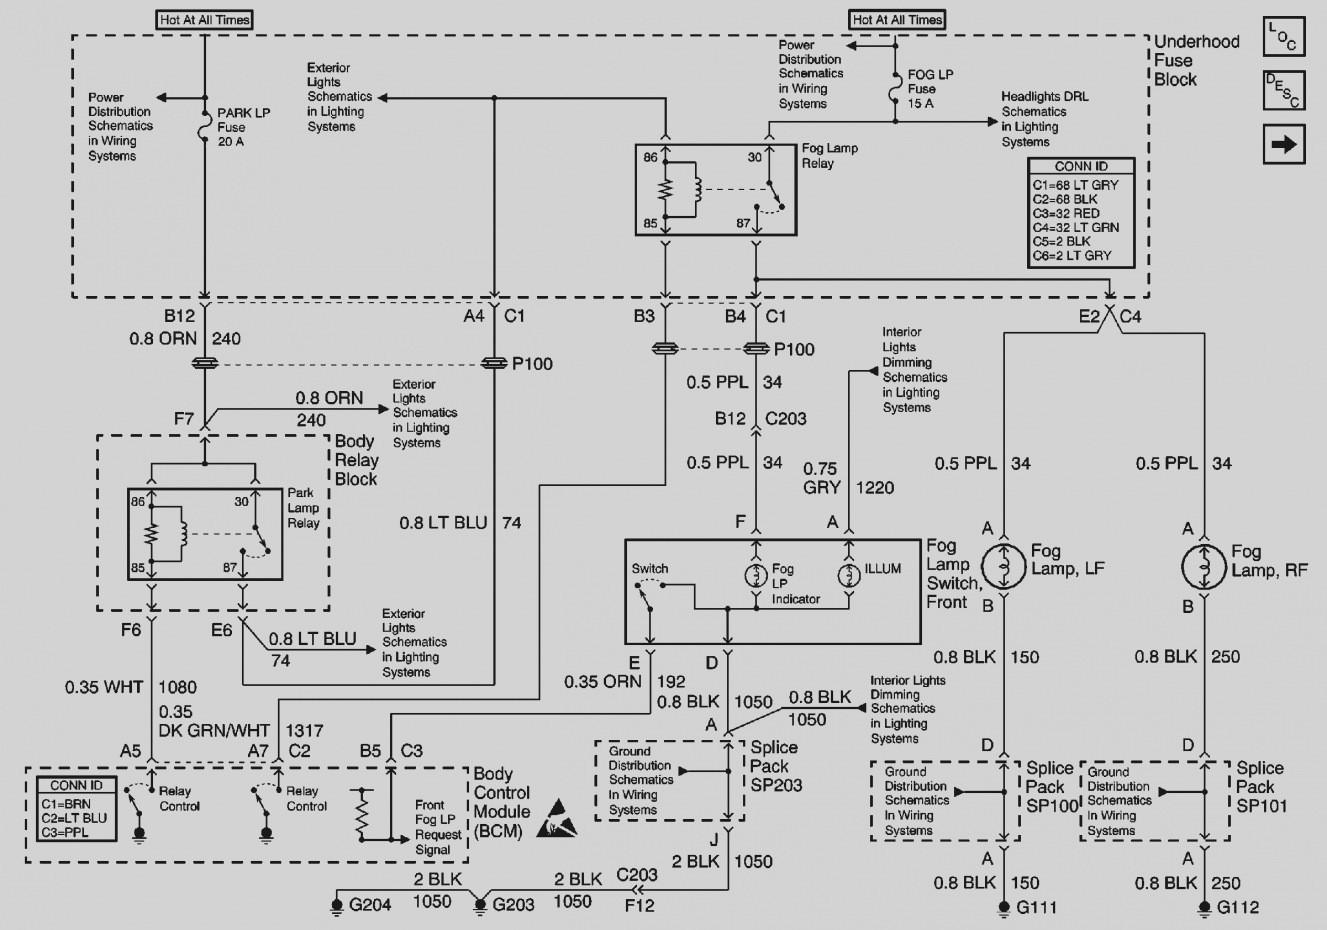 hight resolution of 2002 s10 tail light wiring diagram wiring diagram u2022 rh growbyte co 1992 chevy silverado tail